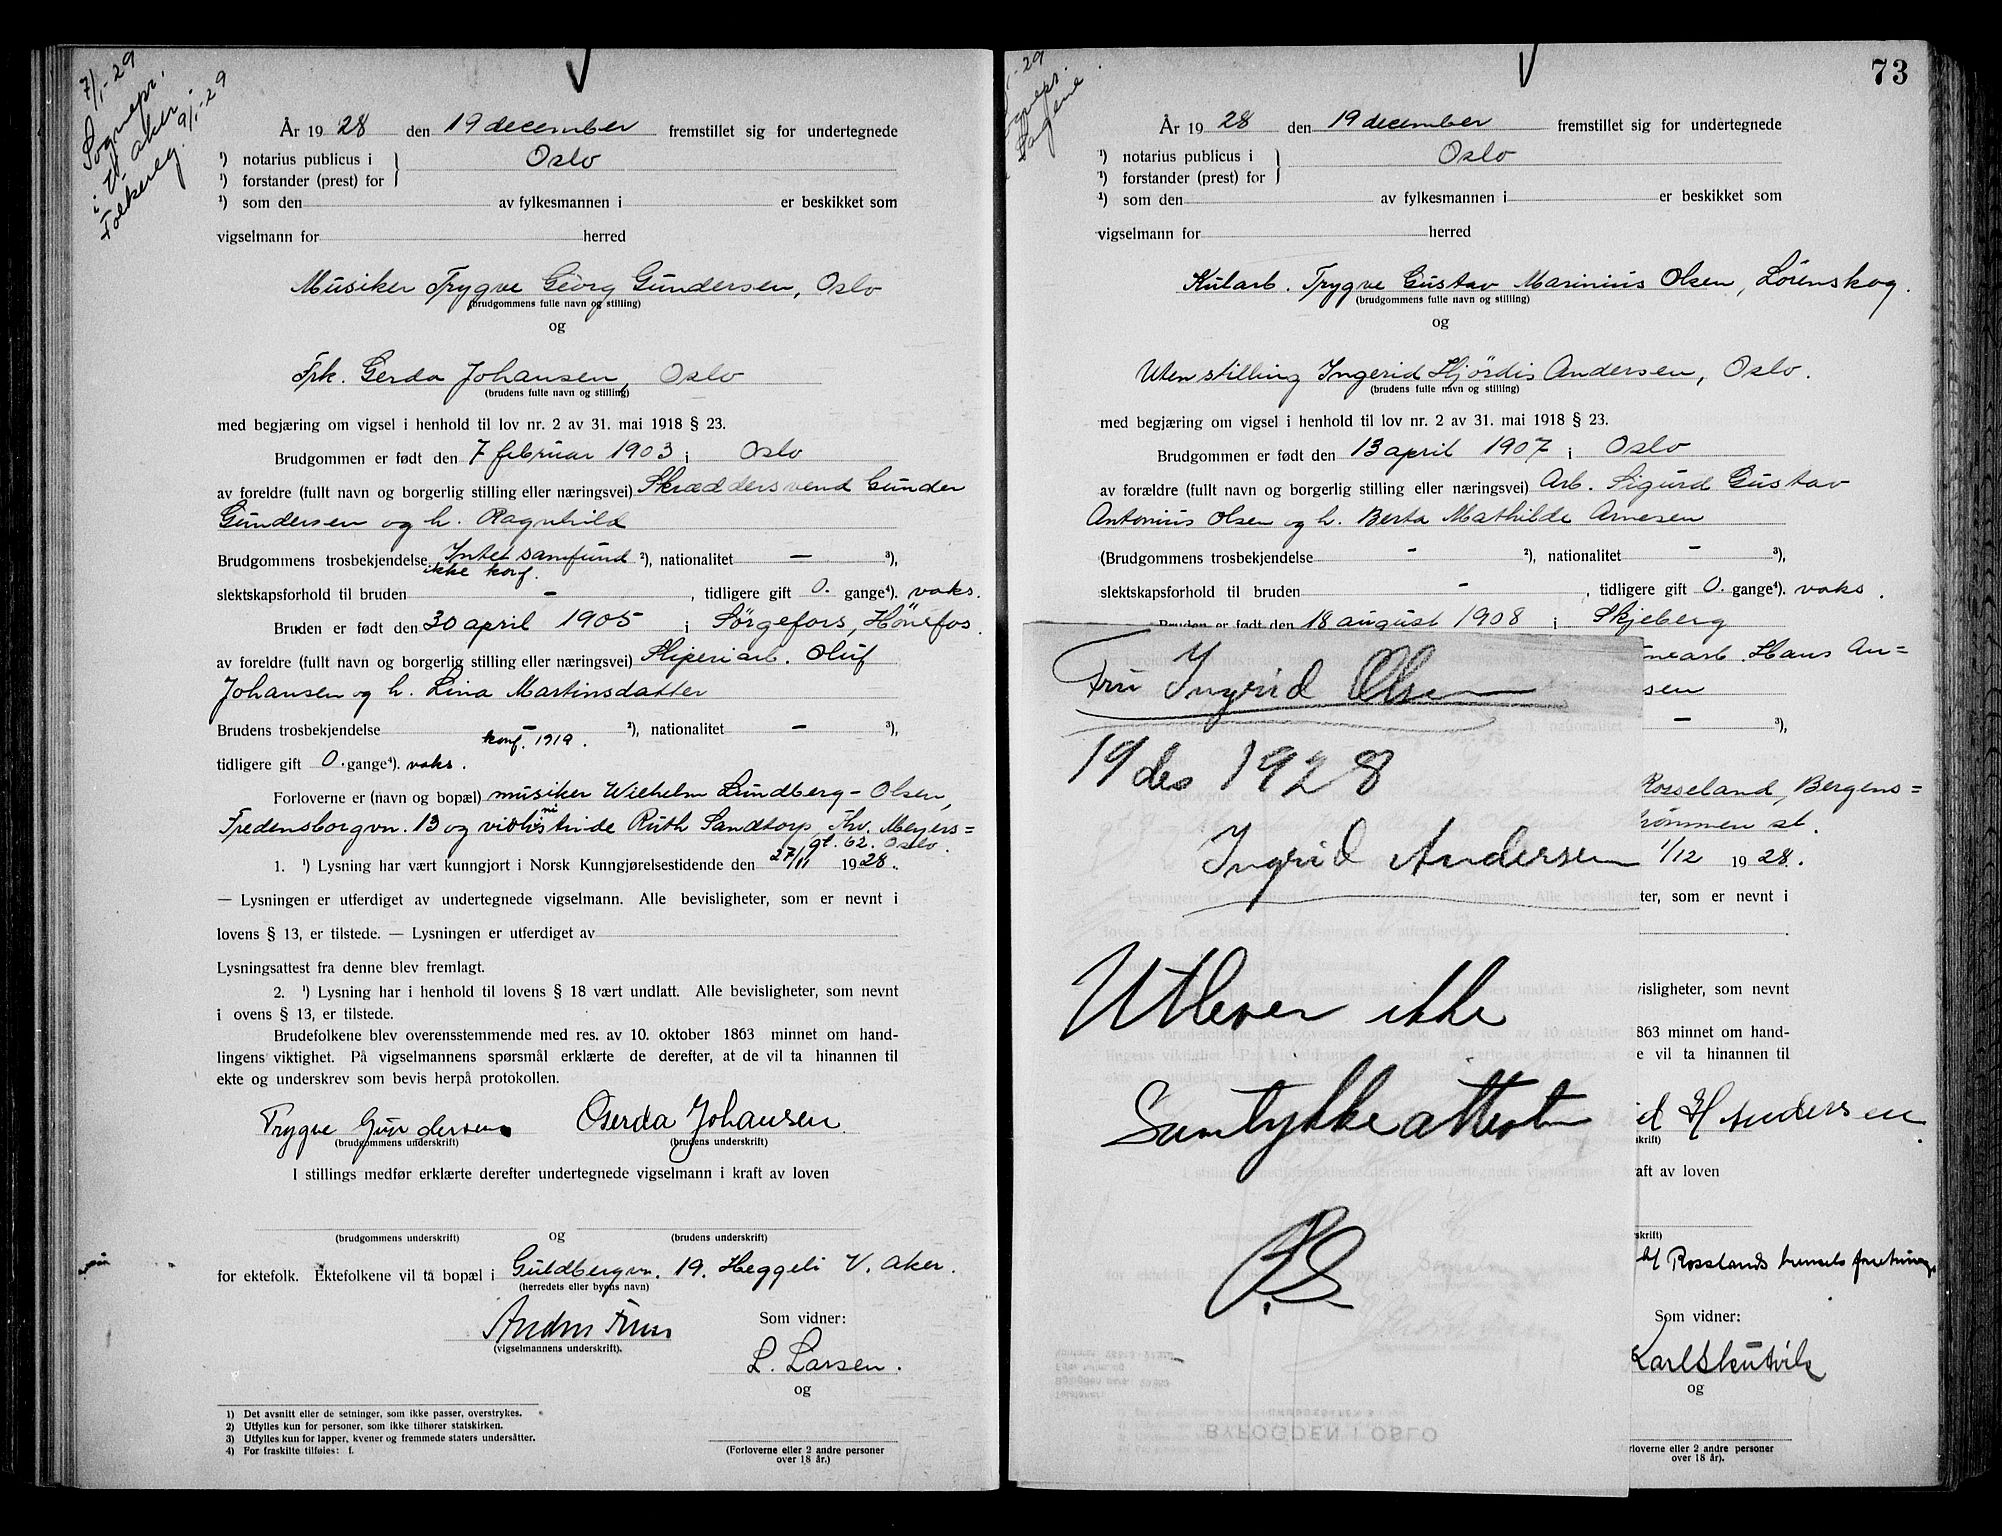 SAO, Oslo byfogd avd. I, L/Lb/Lbb/L0019: Notarialprotokoll, rekke II: Vigsler, 1928-1929, s. 72b-73a